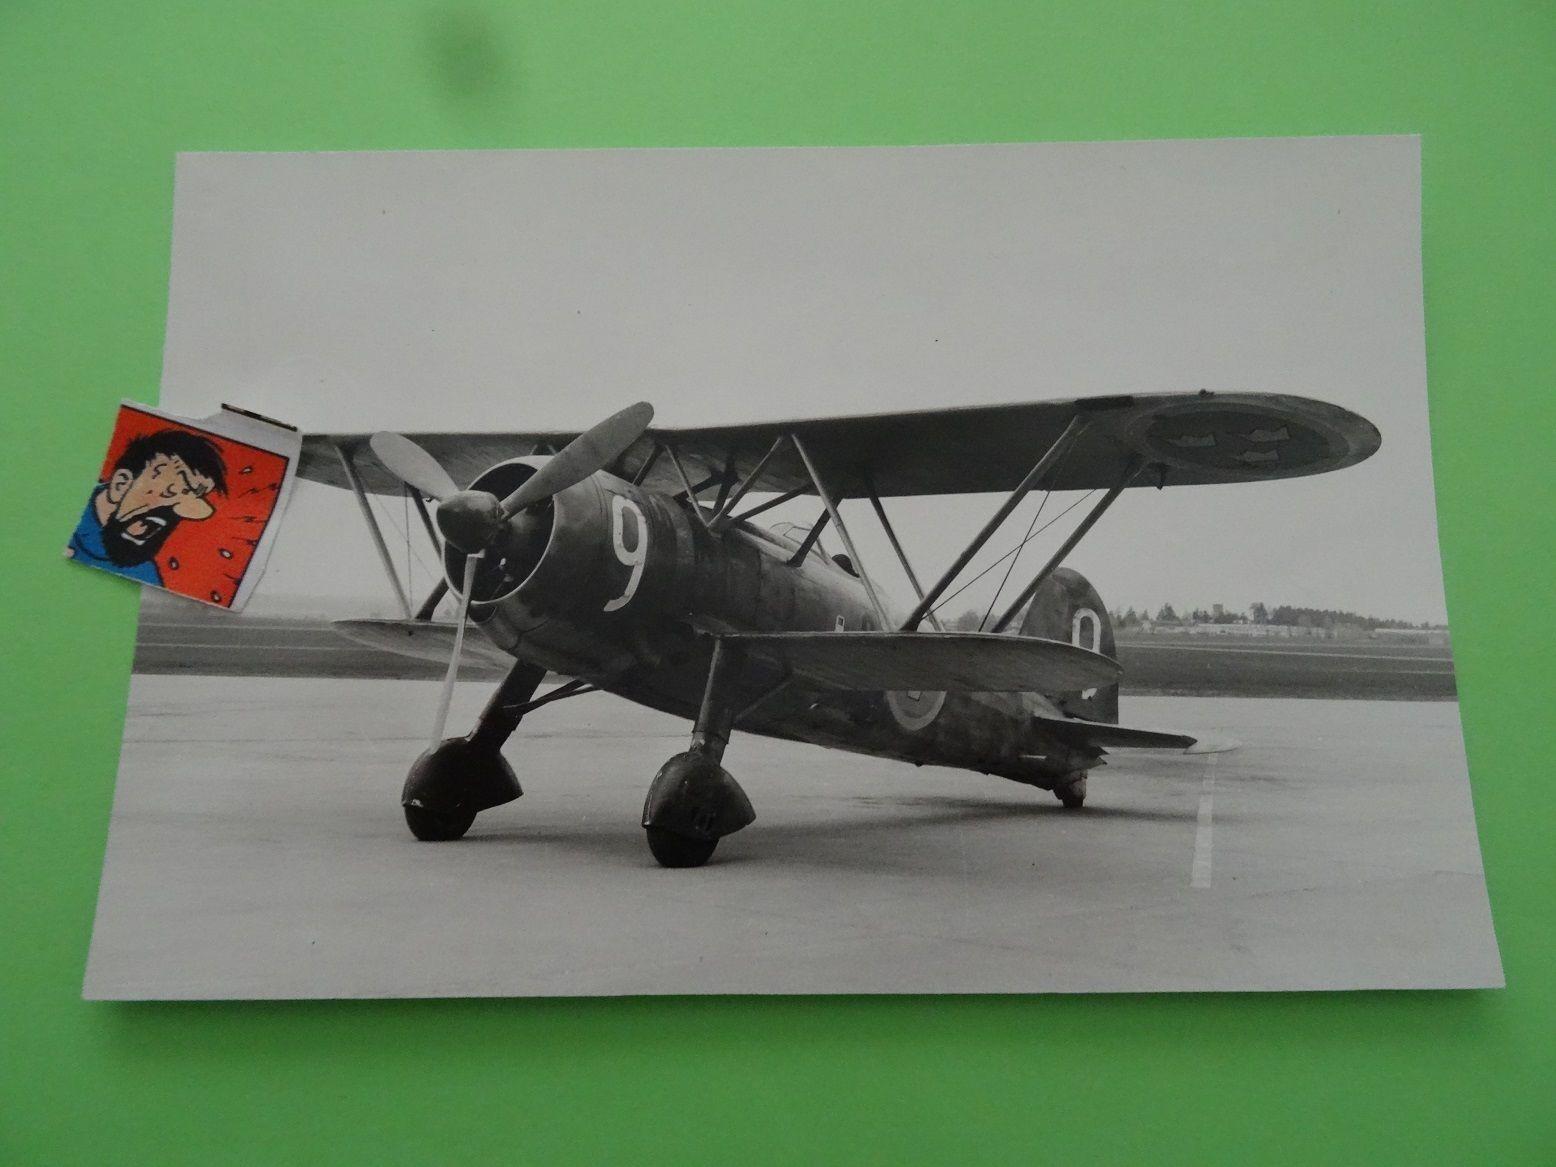 Fiat CR.42 Falco_13_swedish airforce.jpg